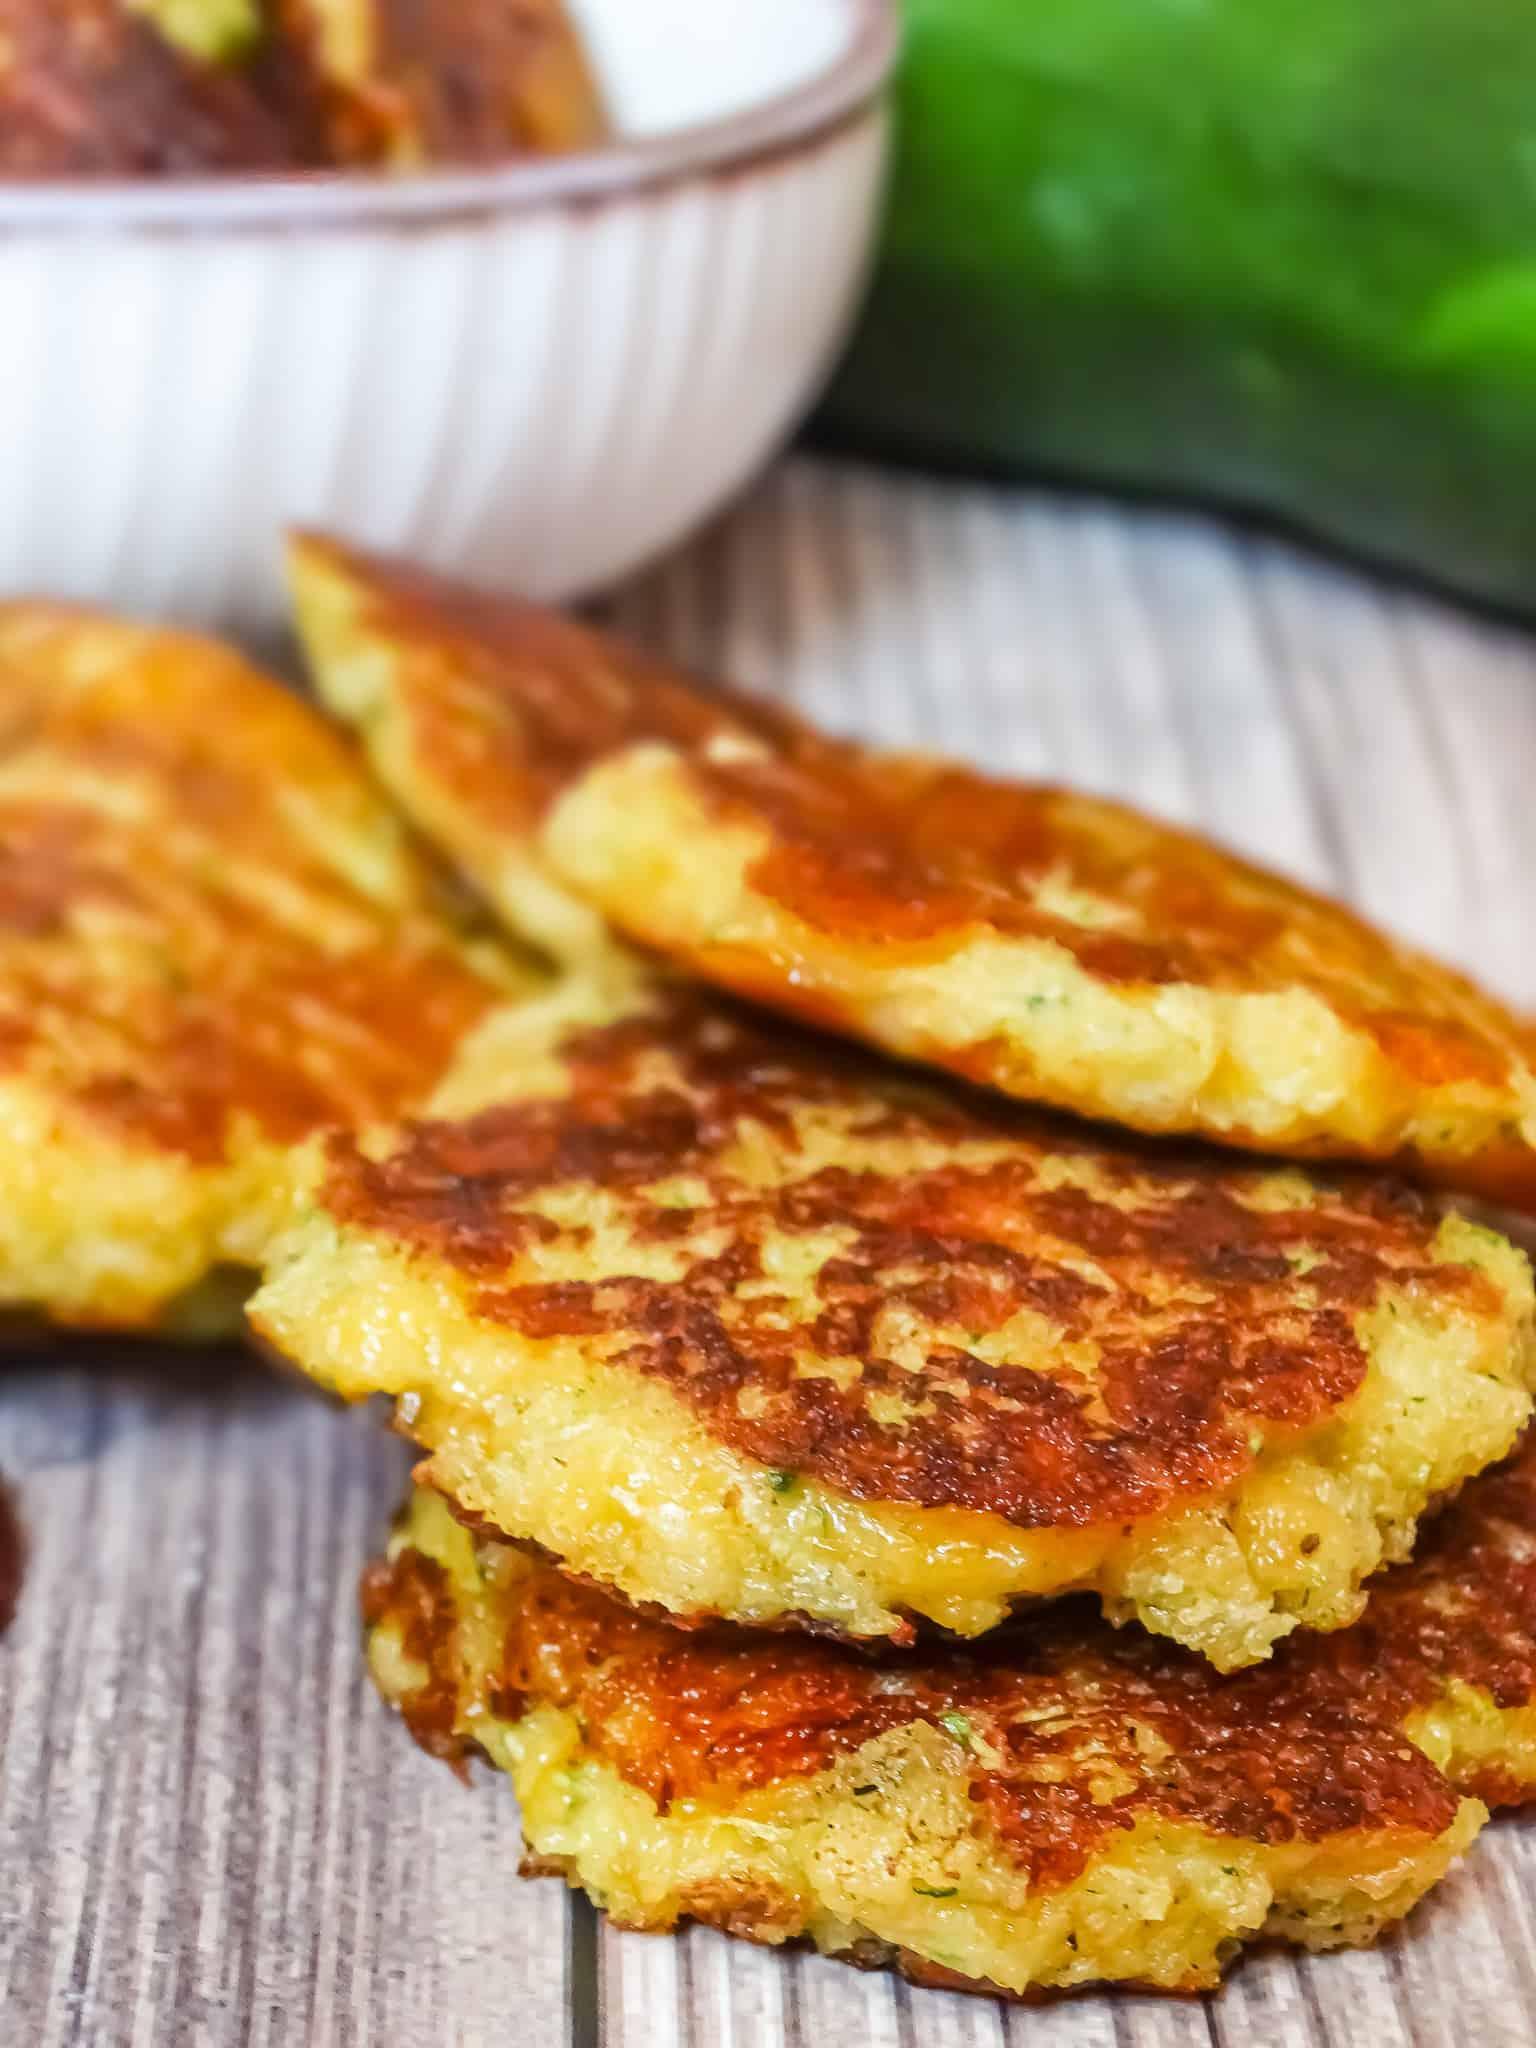 zucchini fritter recipe: cheesy zucchini fritters on a wooden backdrop